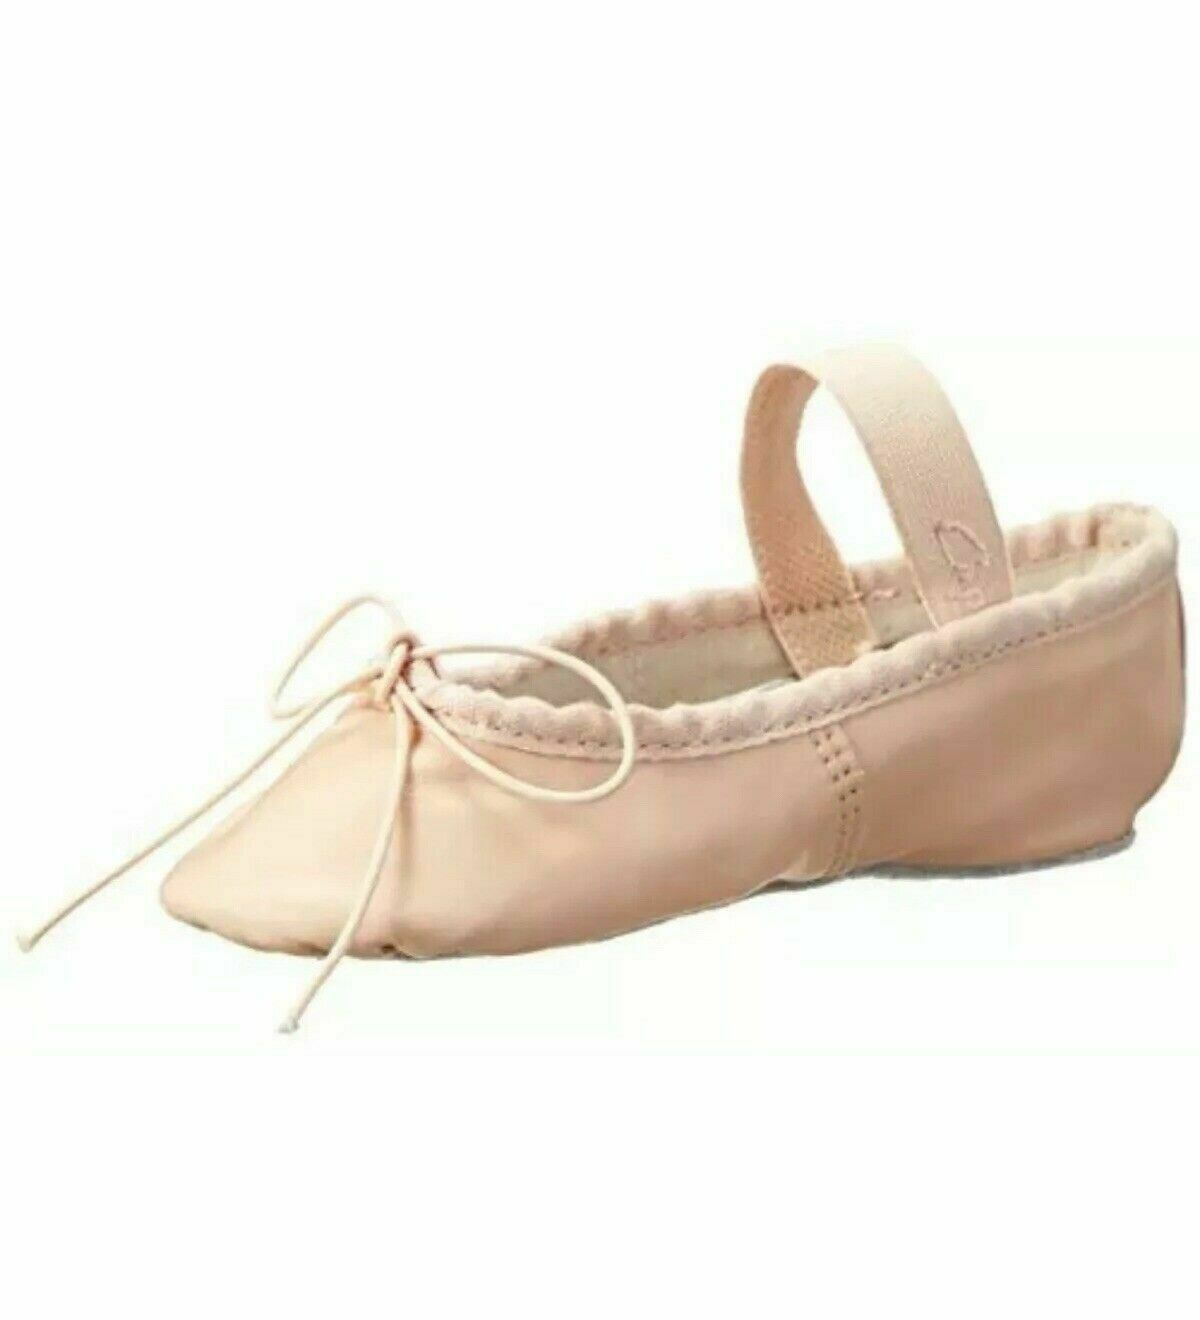 Capezio Adult Teknik 200 NPK Pink Full Sole Ballet Shoe Size 6.5B 6.5 B